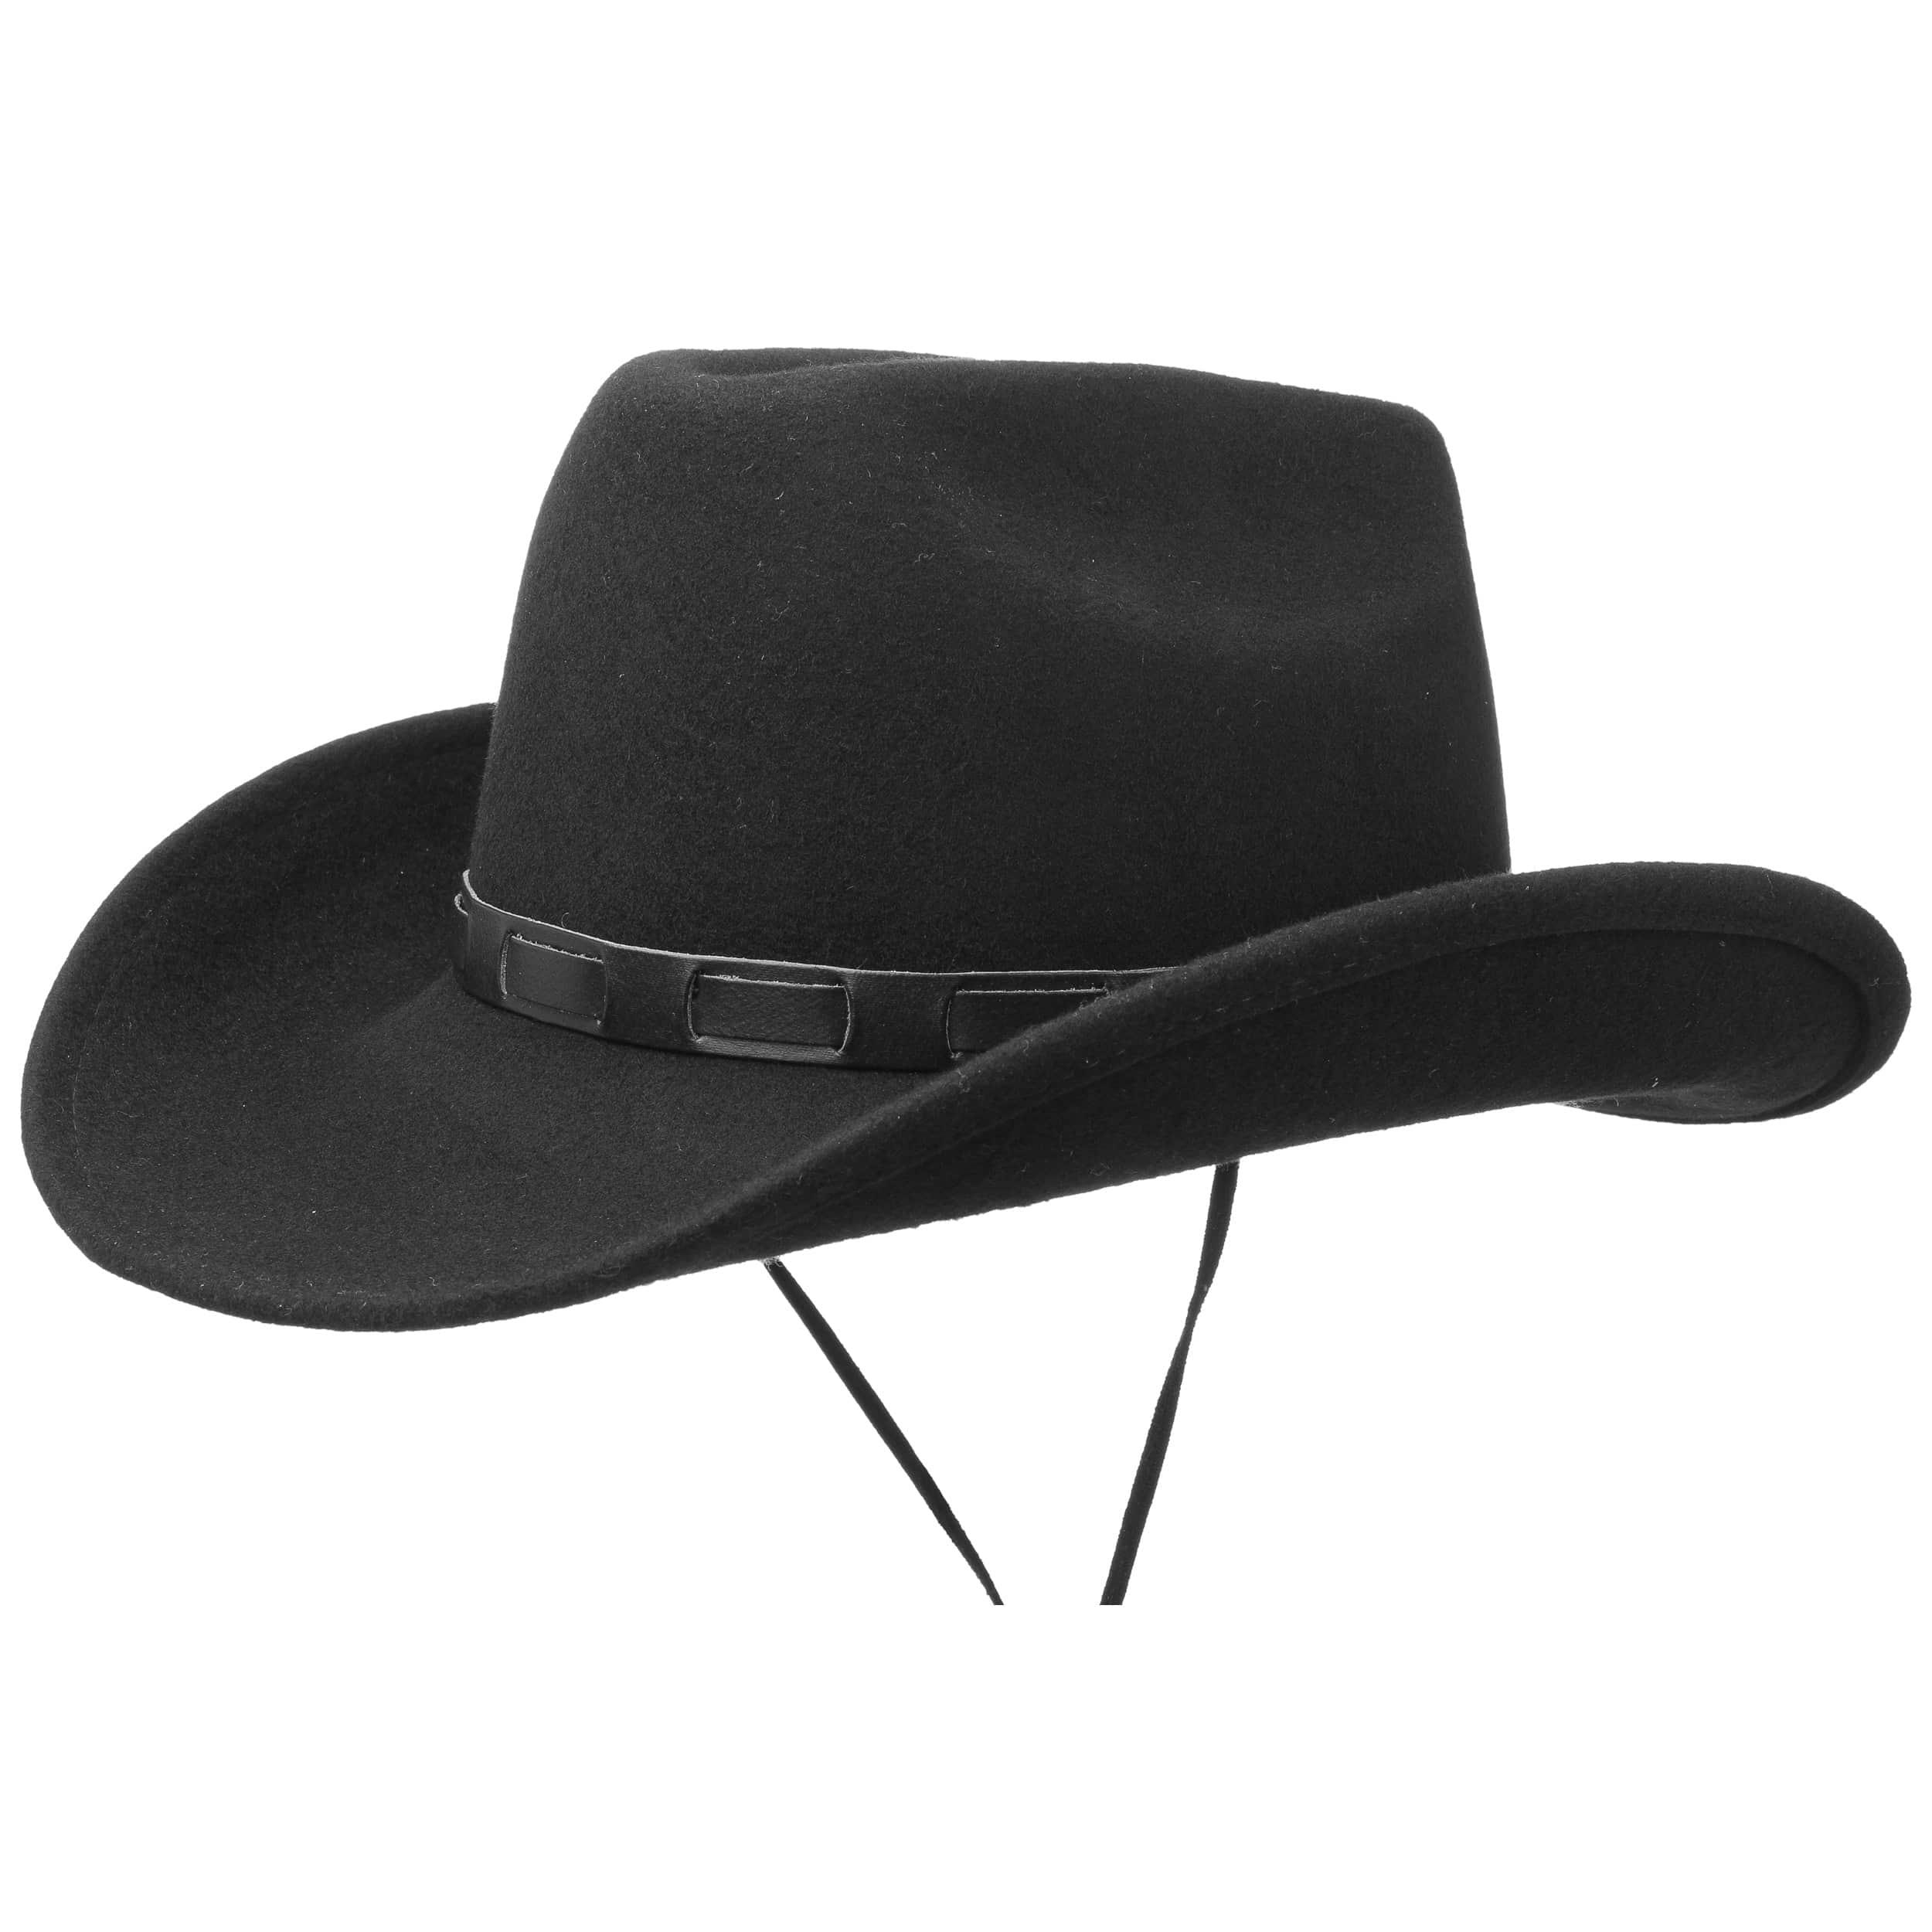 ... Sombrero Bill Cody con Cinta Barbilla by Lipodo - negro 4 ... 11370dc5d043